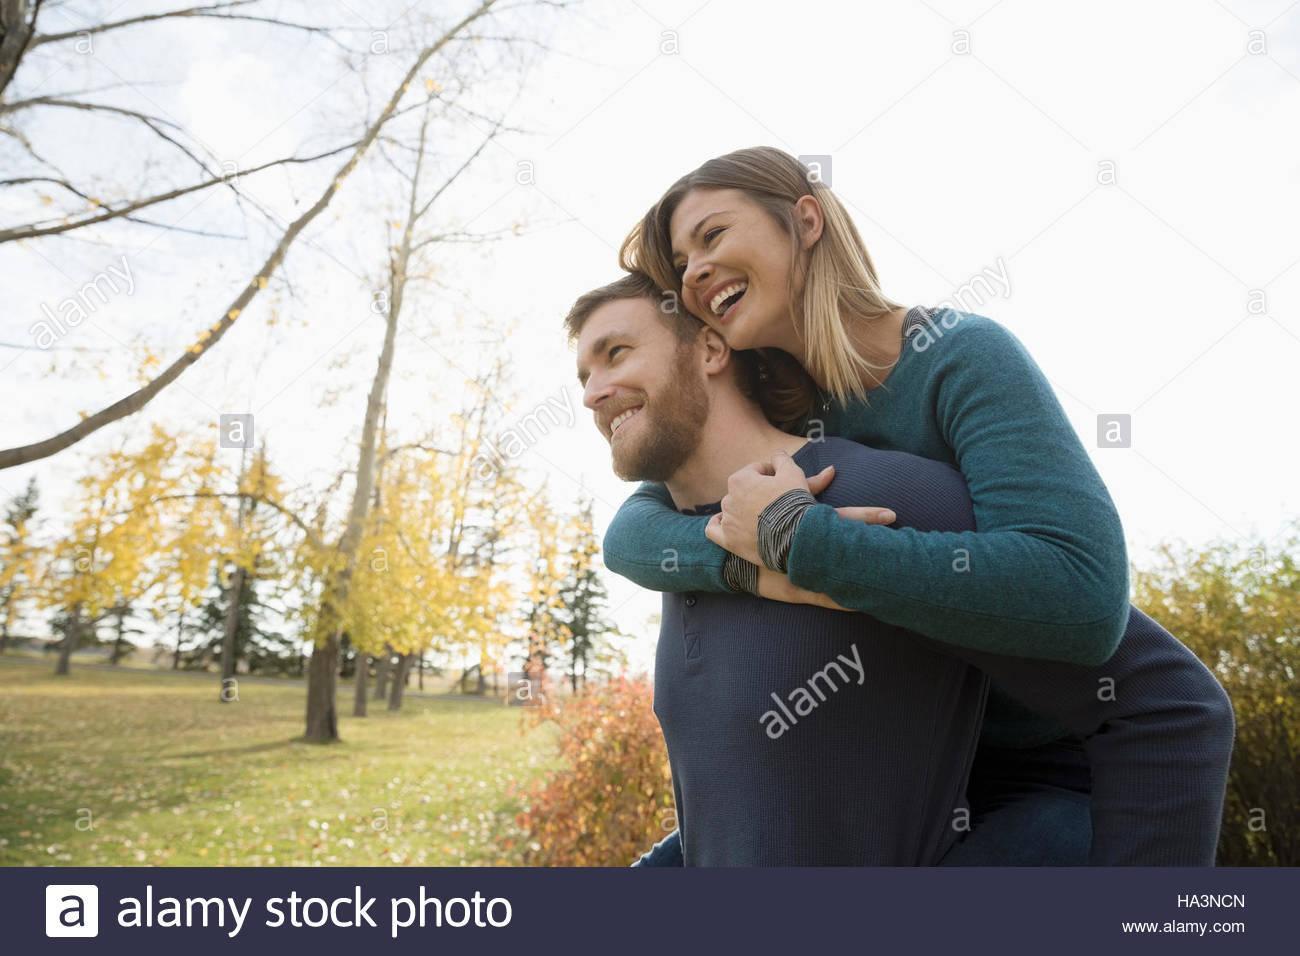 Glückliches Paar Huckepack im Herbst park Stockbild